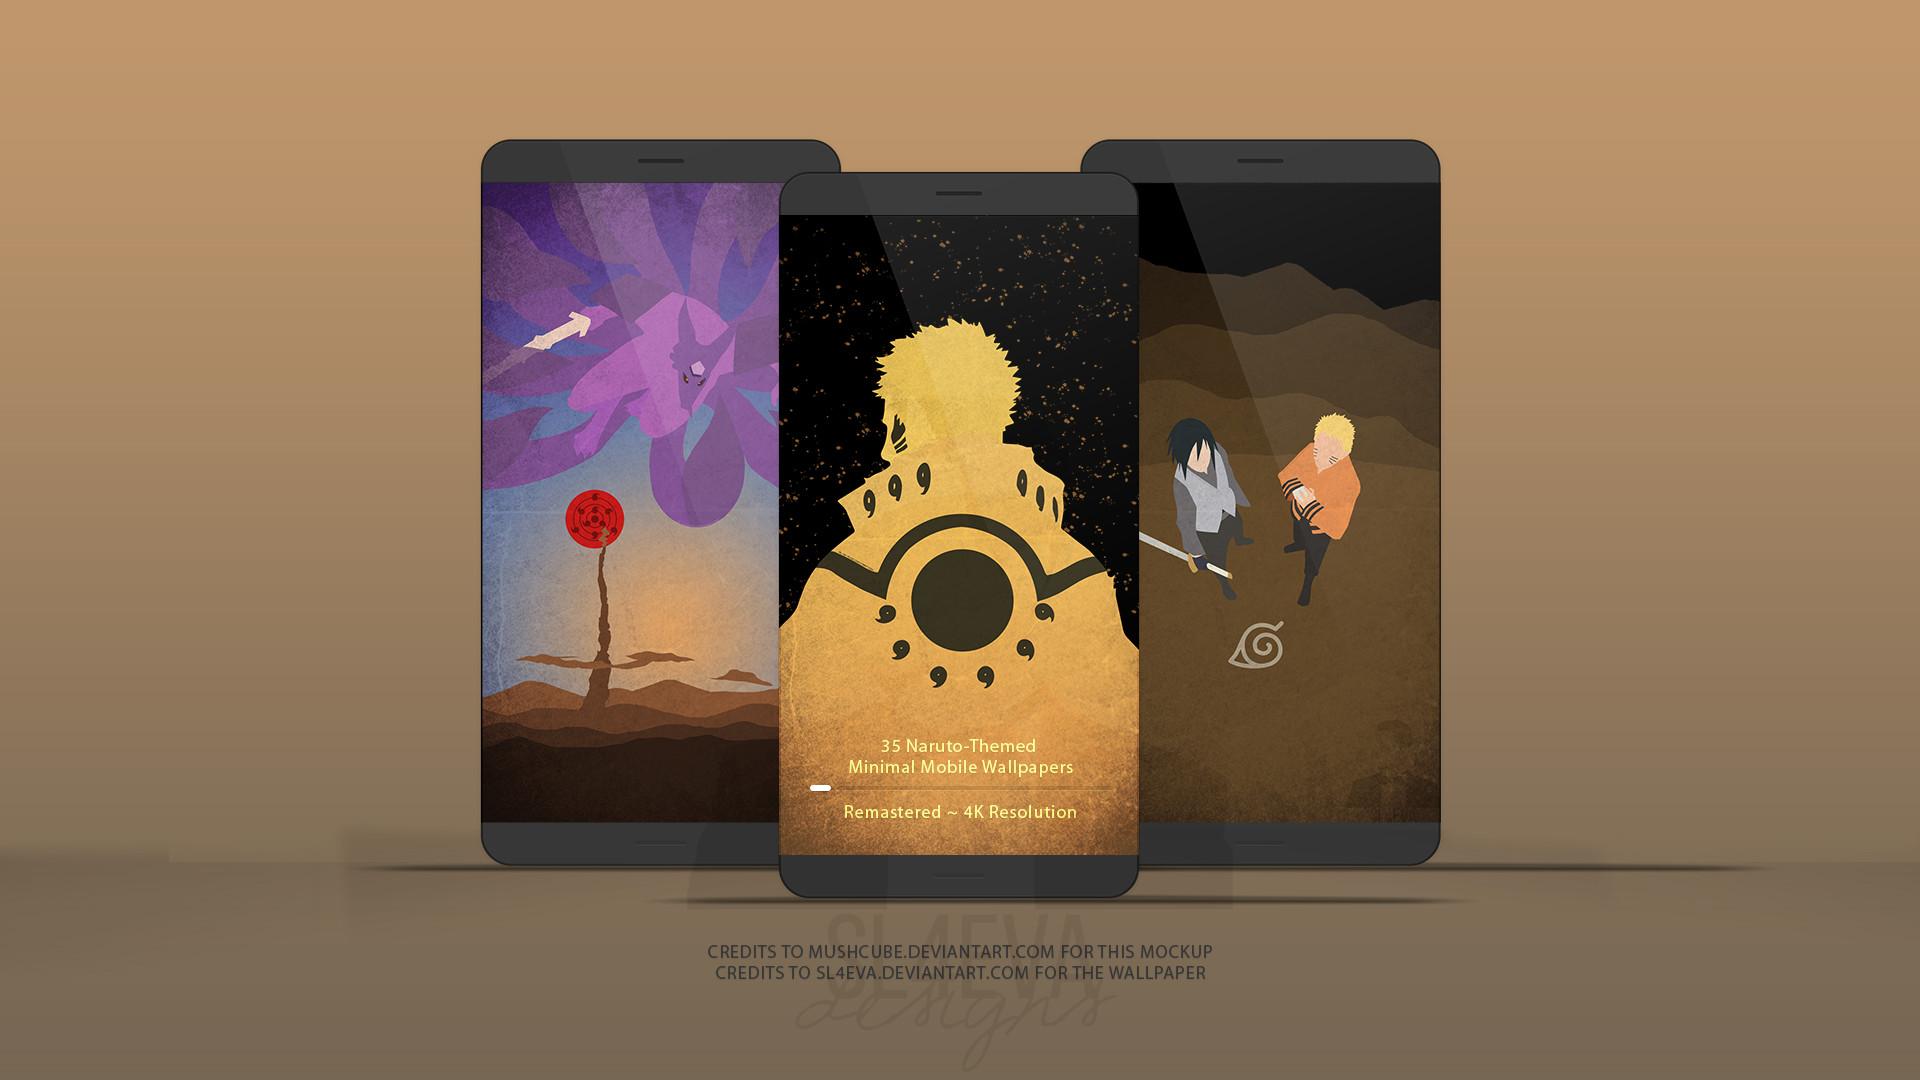 … [4K] Naruto Minimal Mobile Wallpapers Remastered by SL4eva